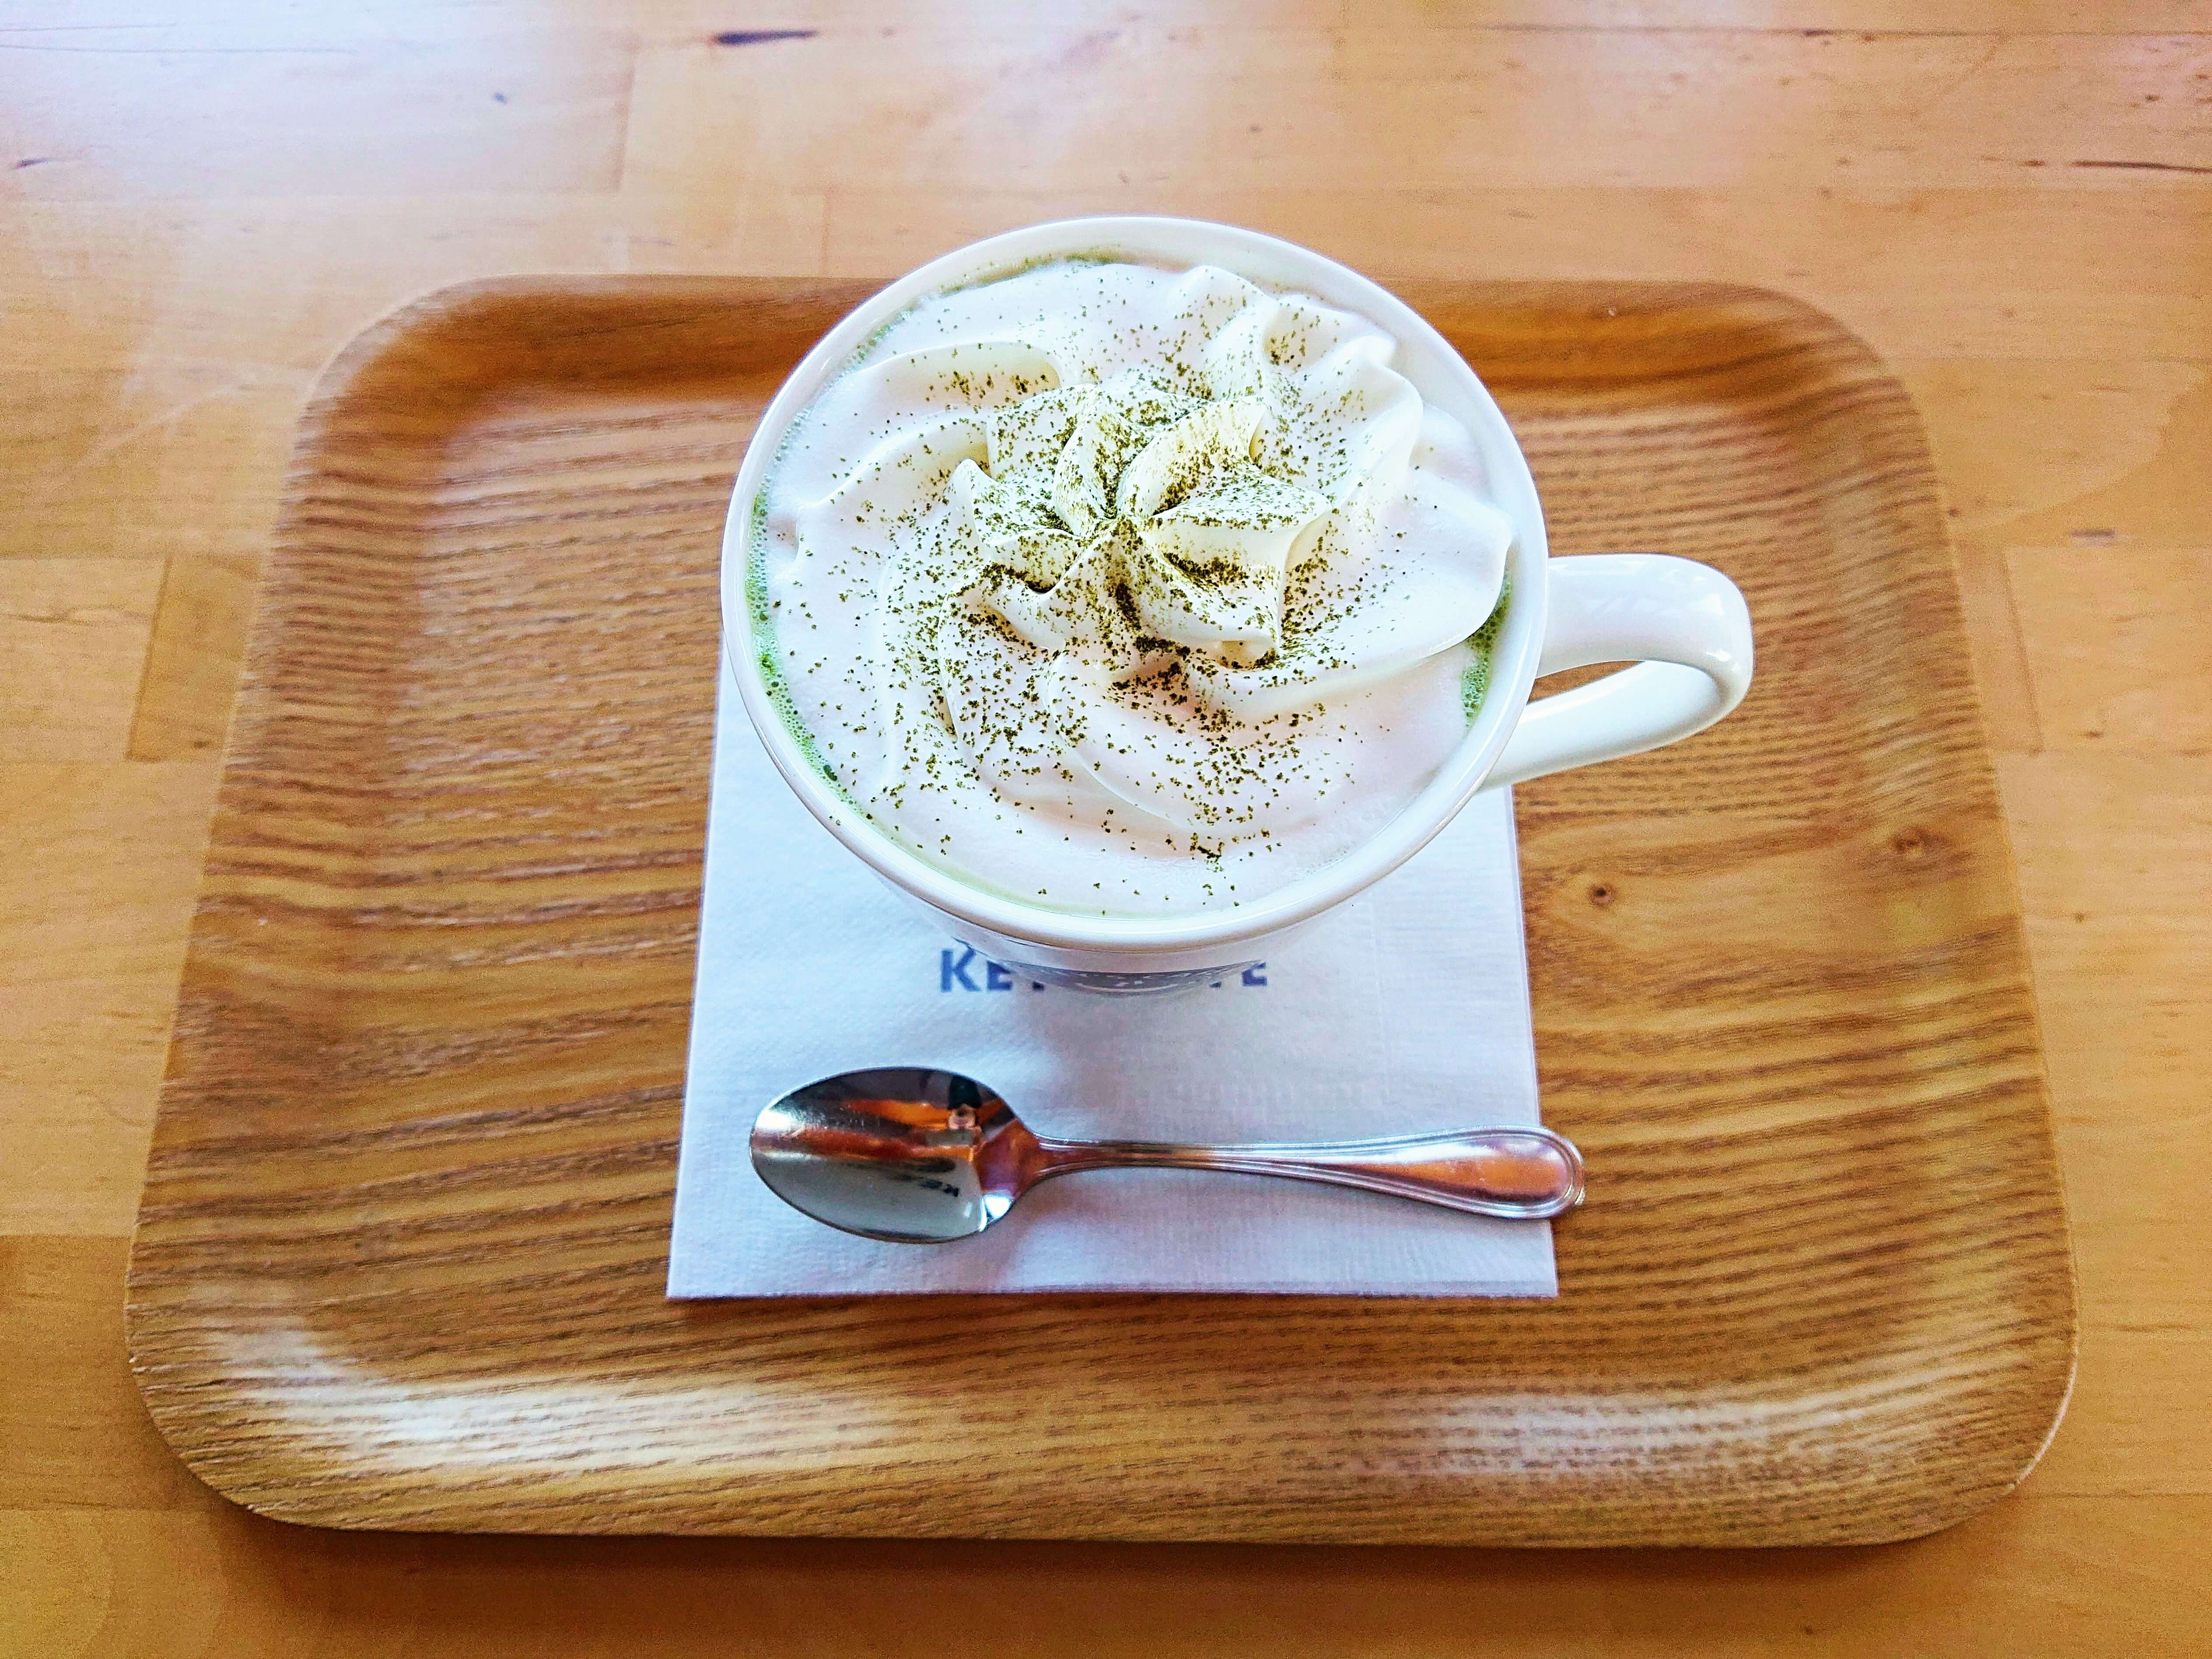 Key's cafe 時夢創屋の抹茶ラテ